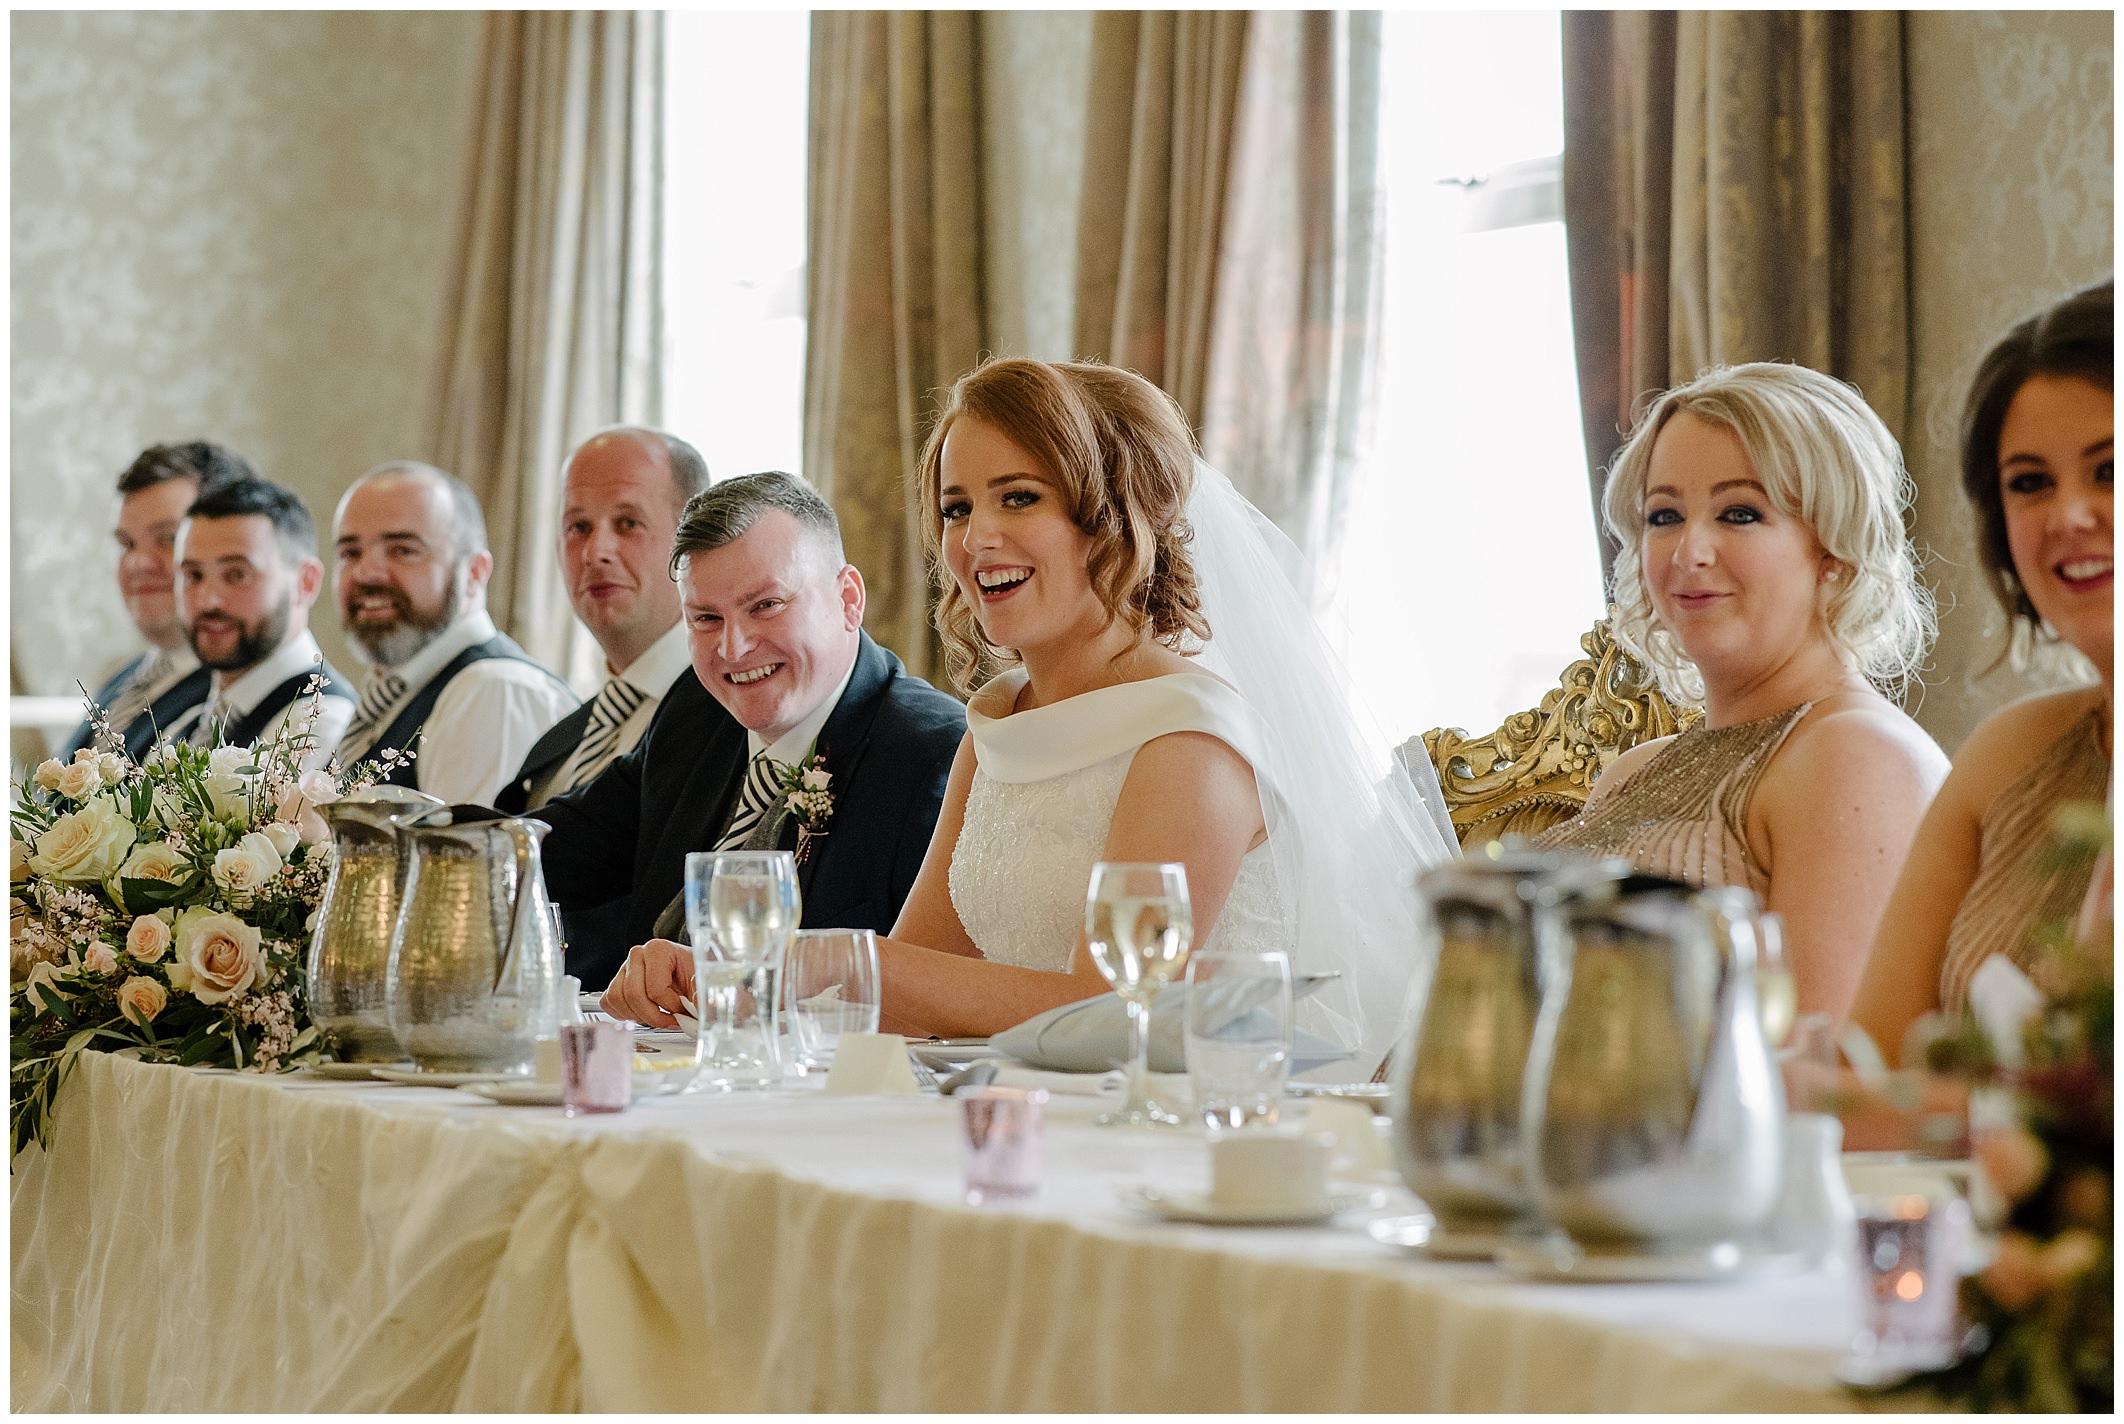 corick-house-wedding-hannah-gary-jude-browne-photography_0077.jpg